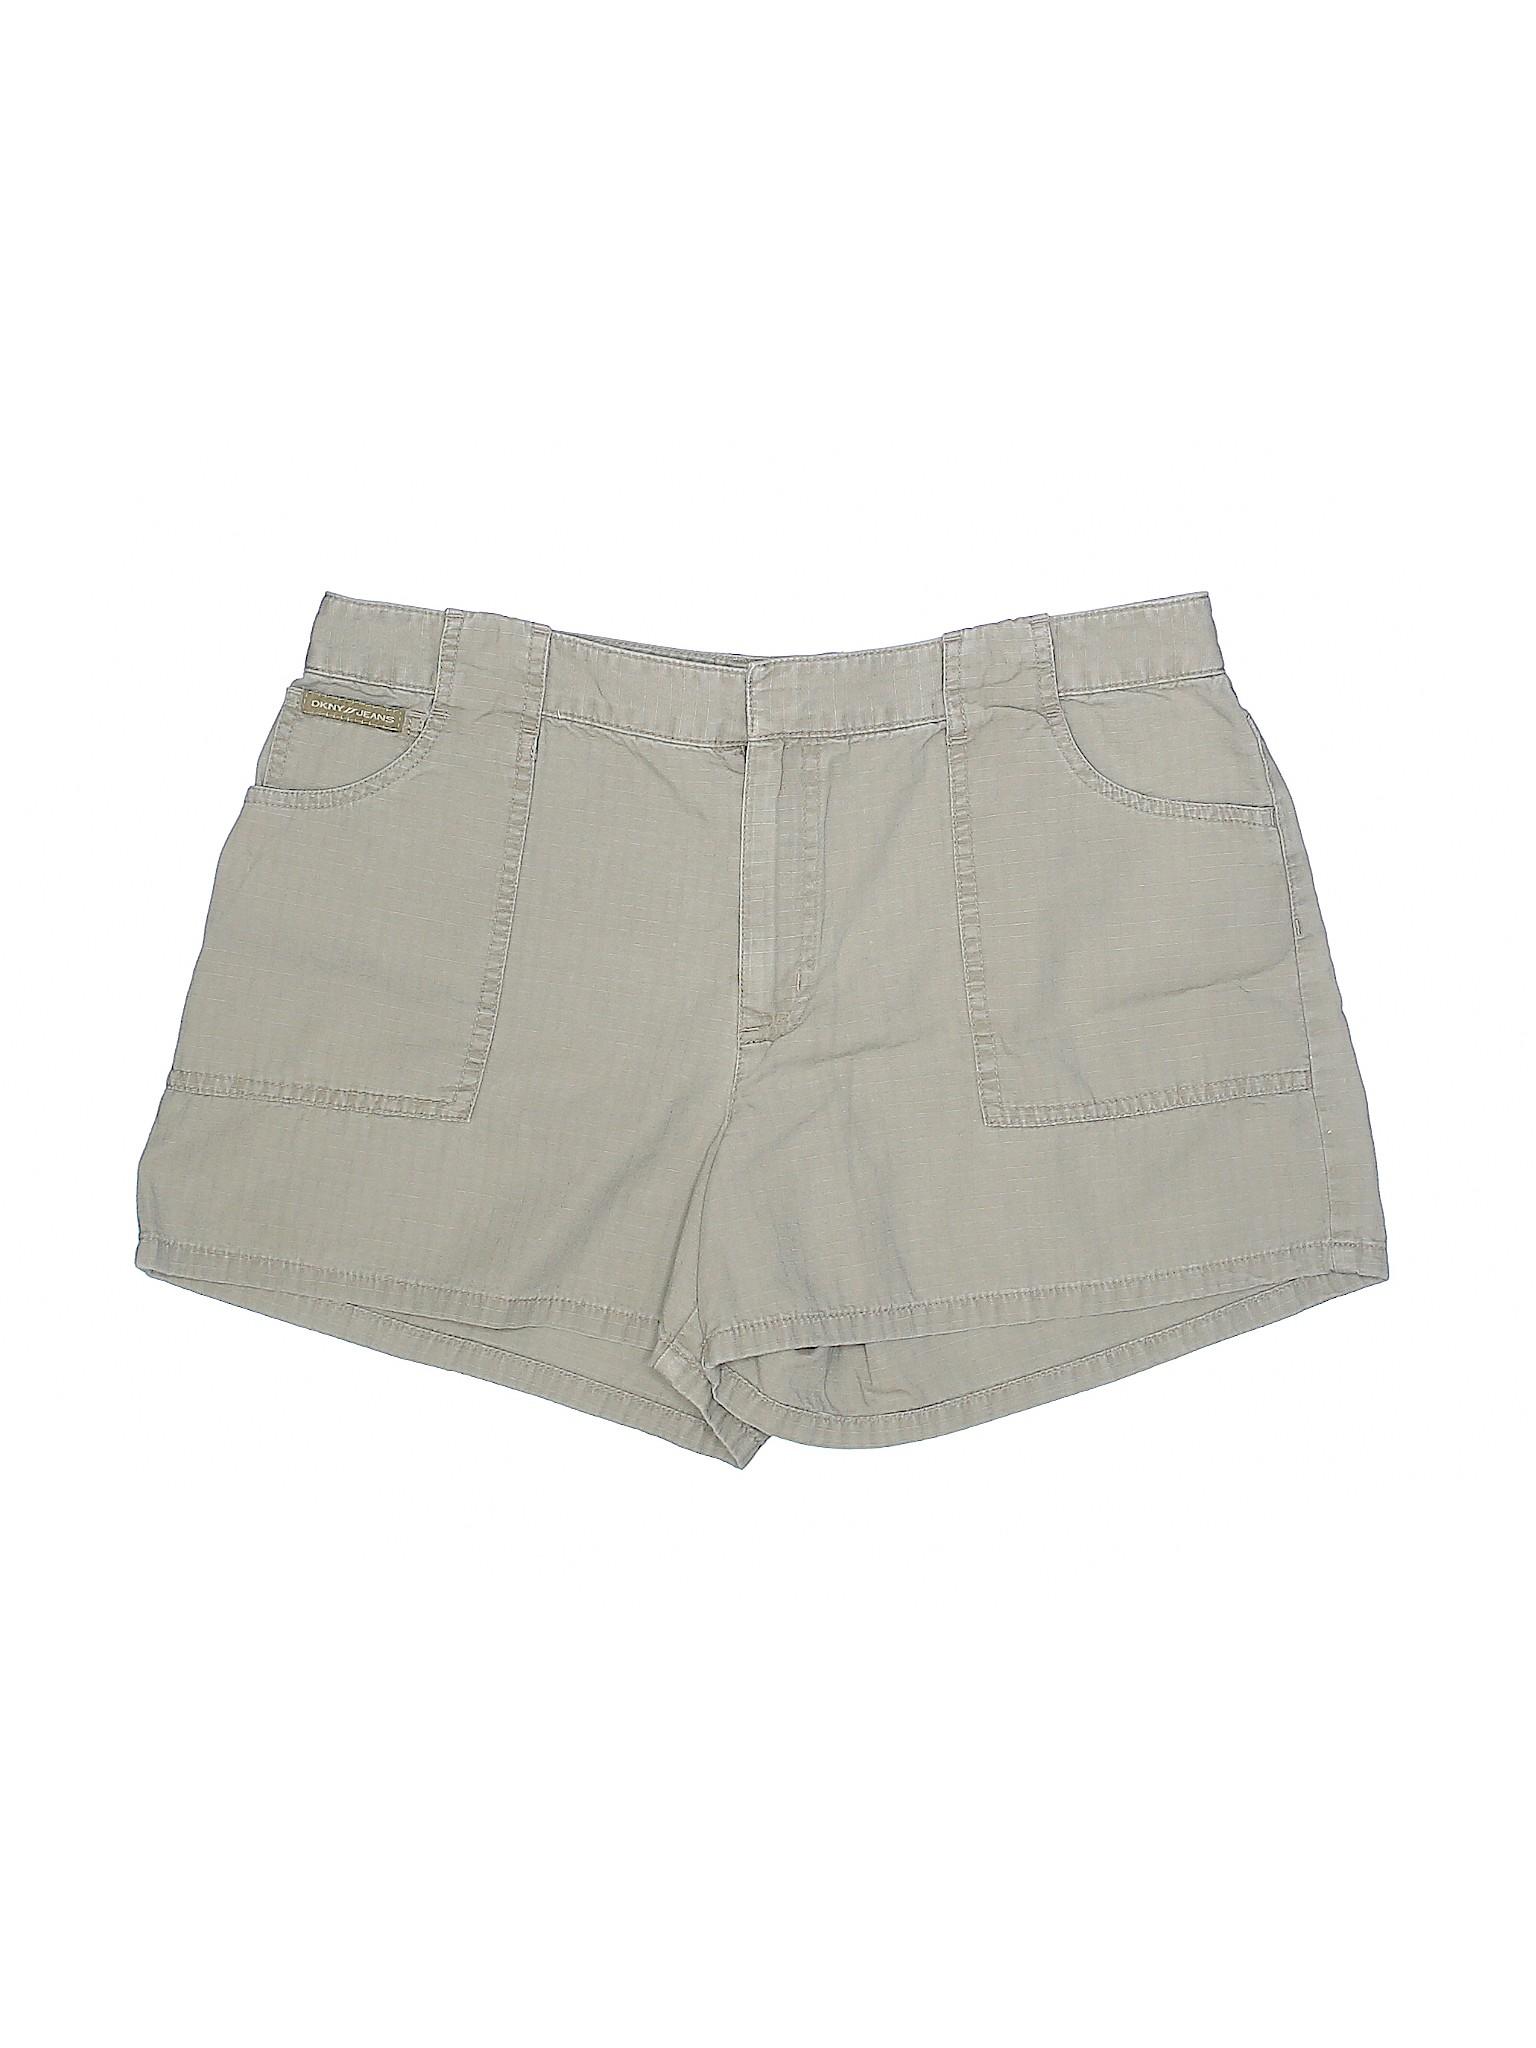 Khaki Leisure Jeans winter DKNY Shorts px6Pw4xq